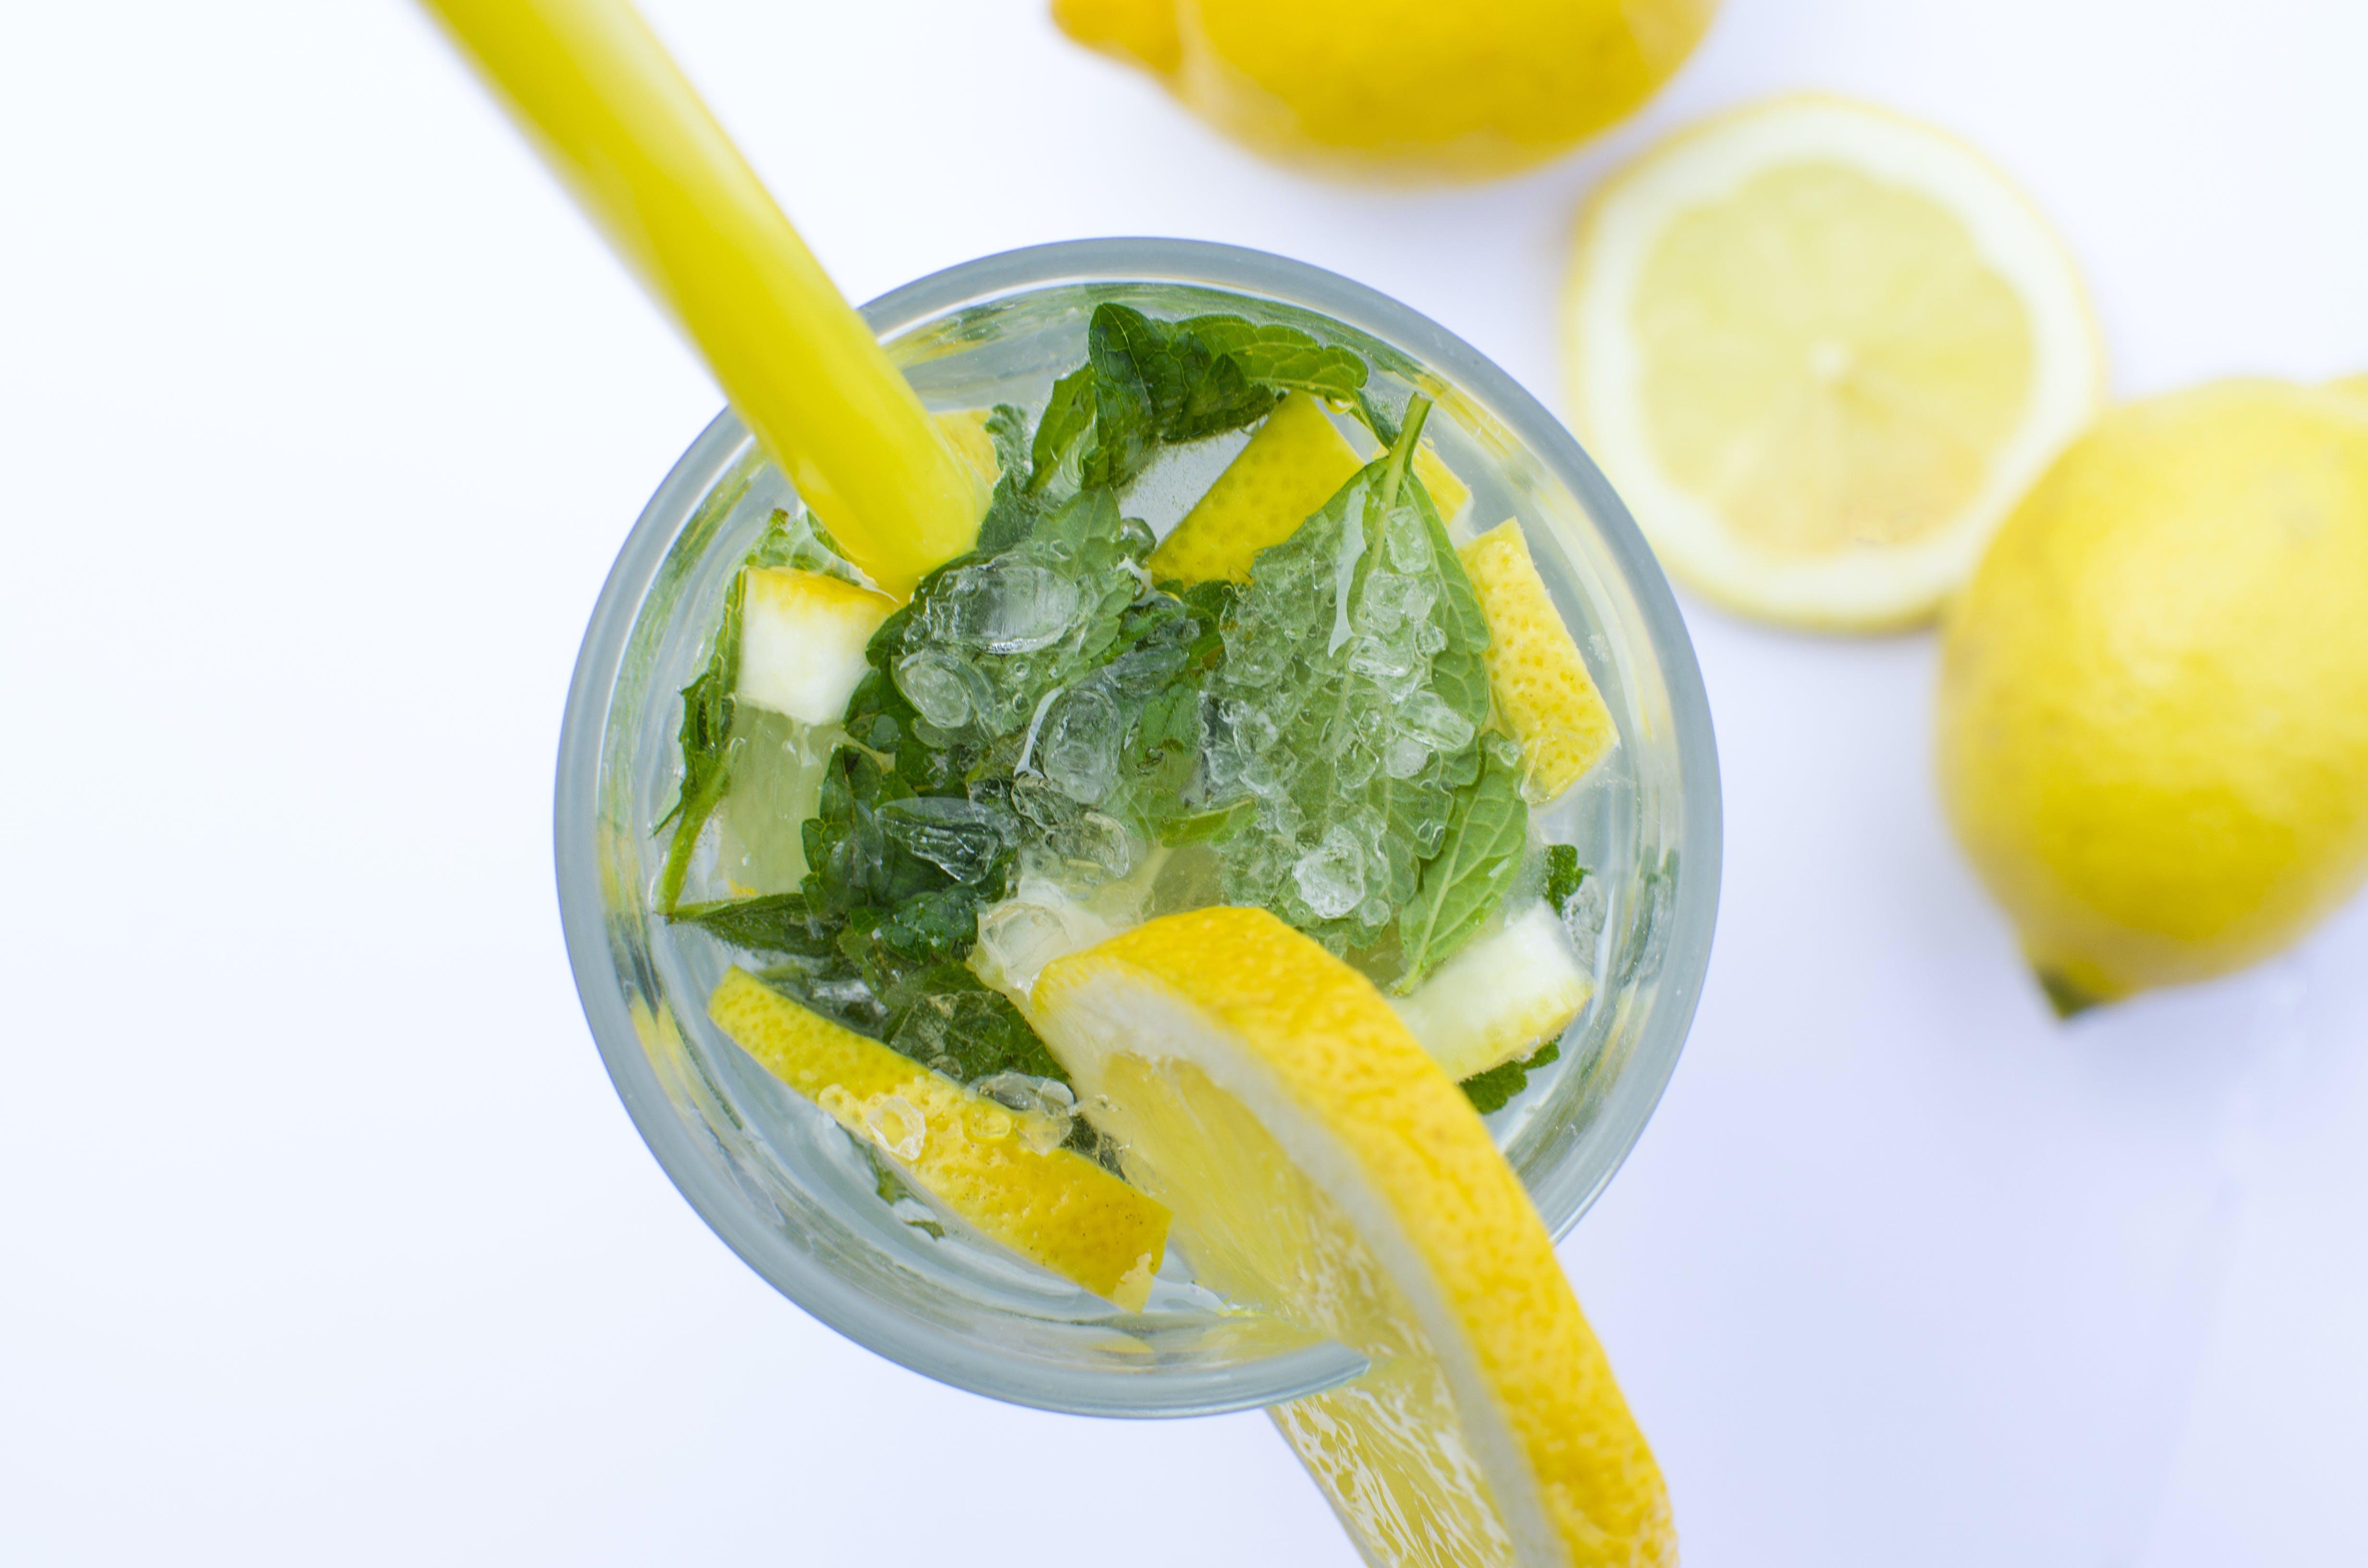 Flat Lay Photograph of Highball Glass With Sliced Lemon